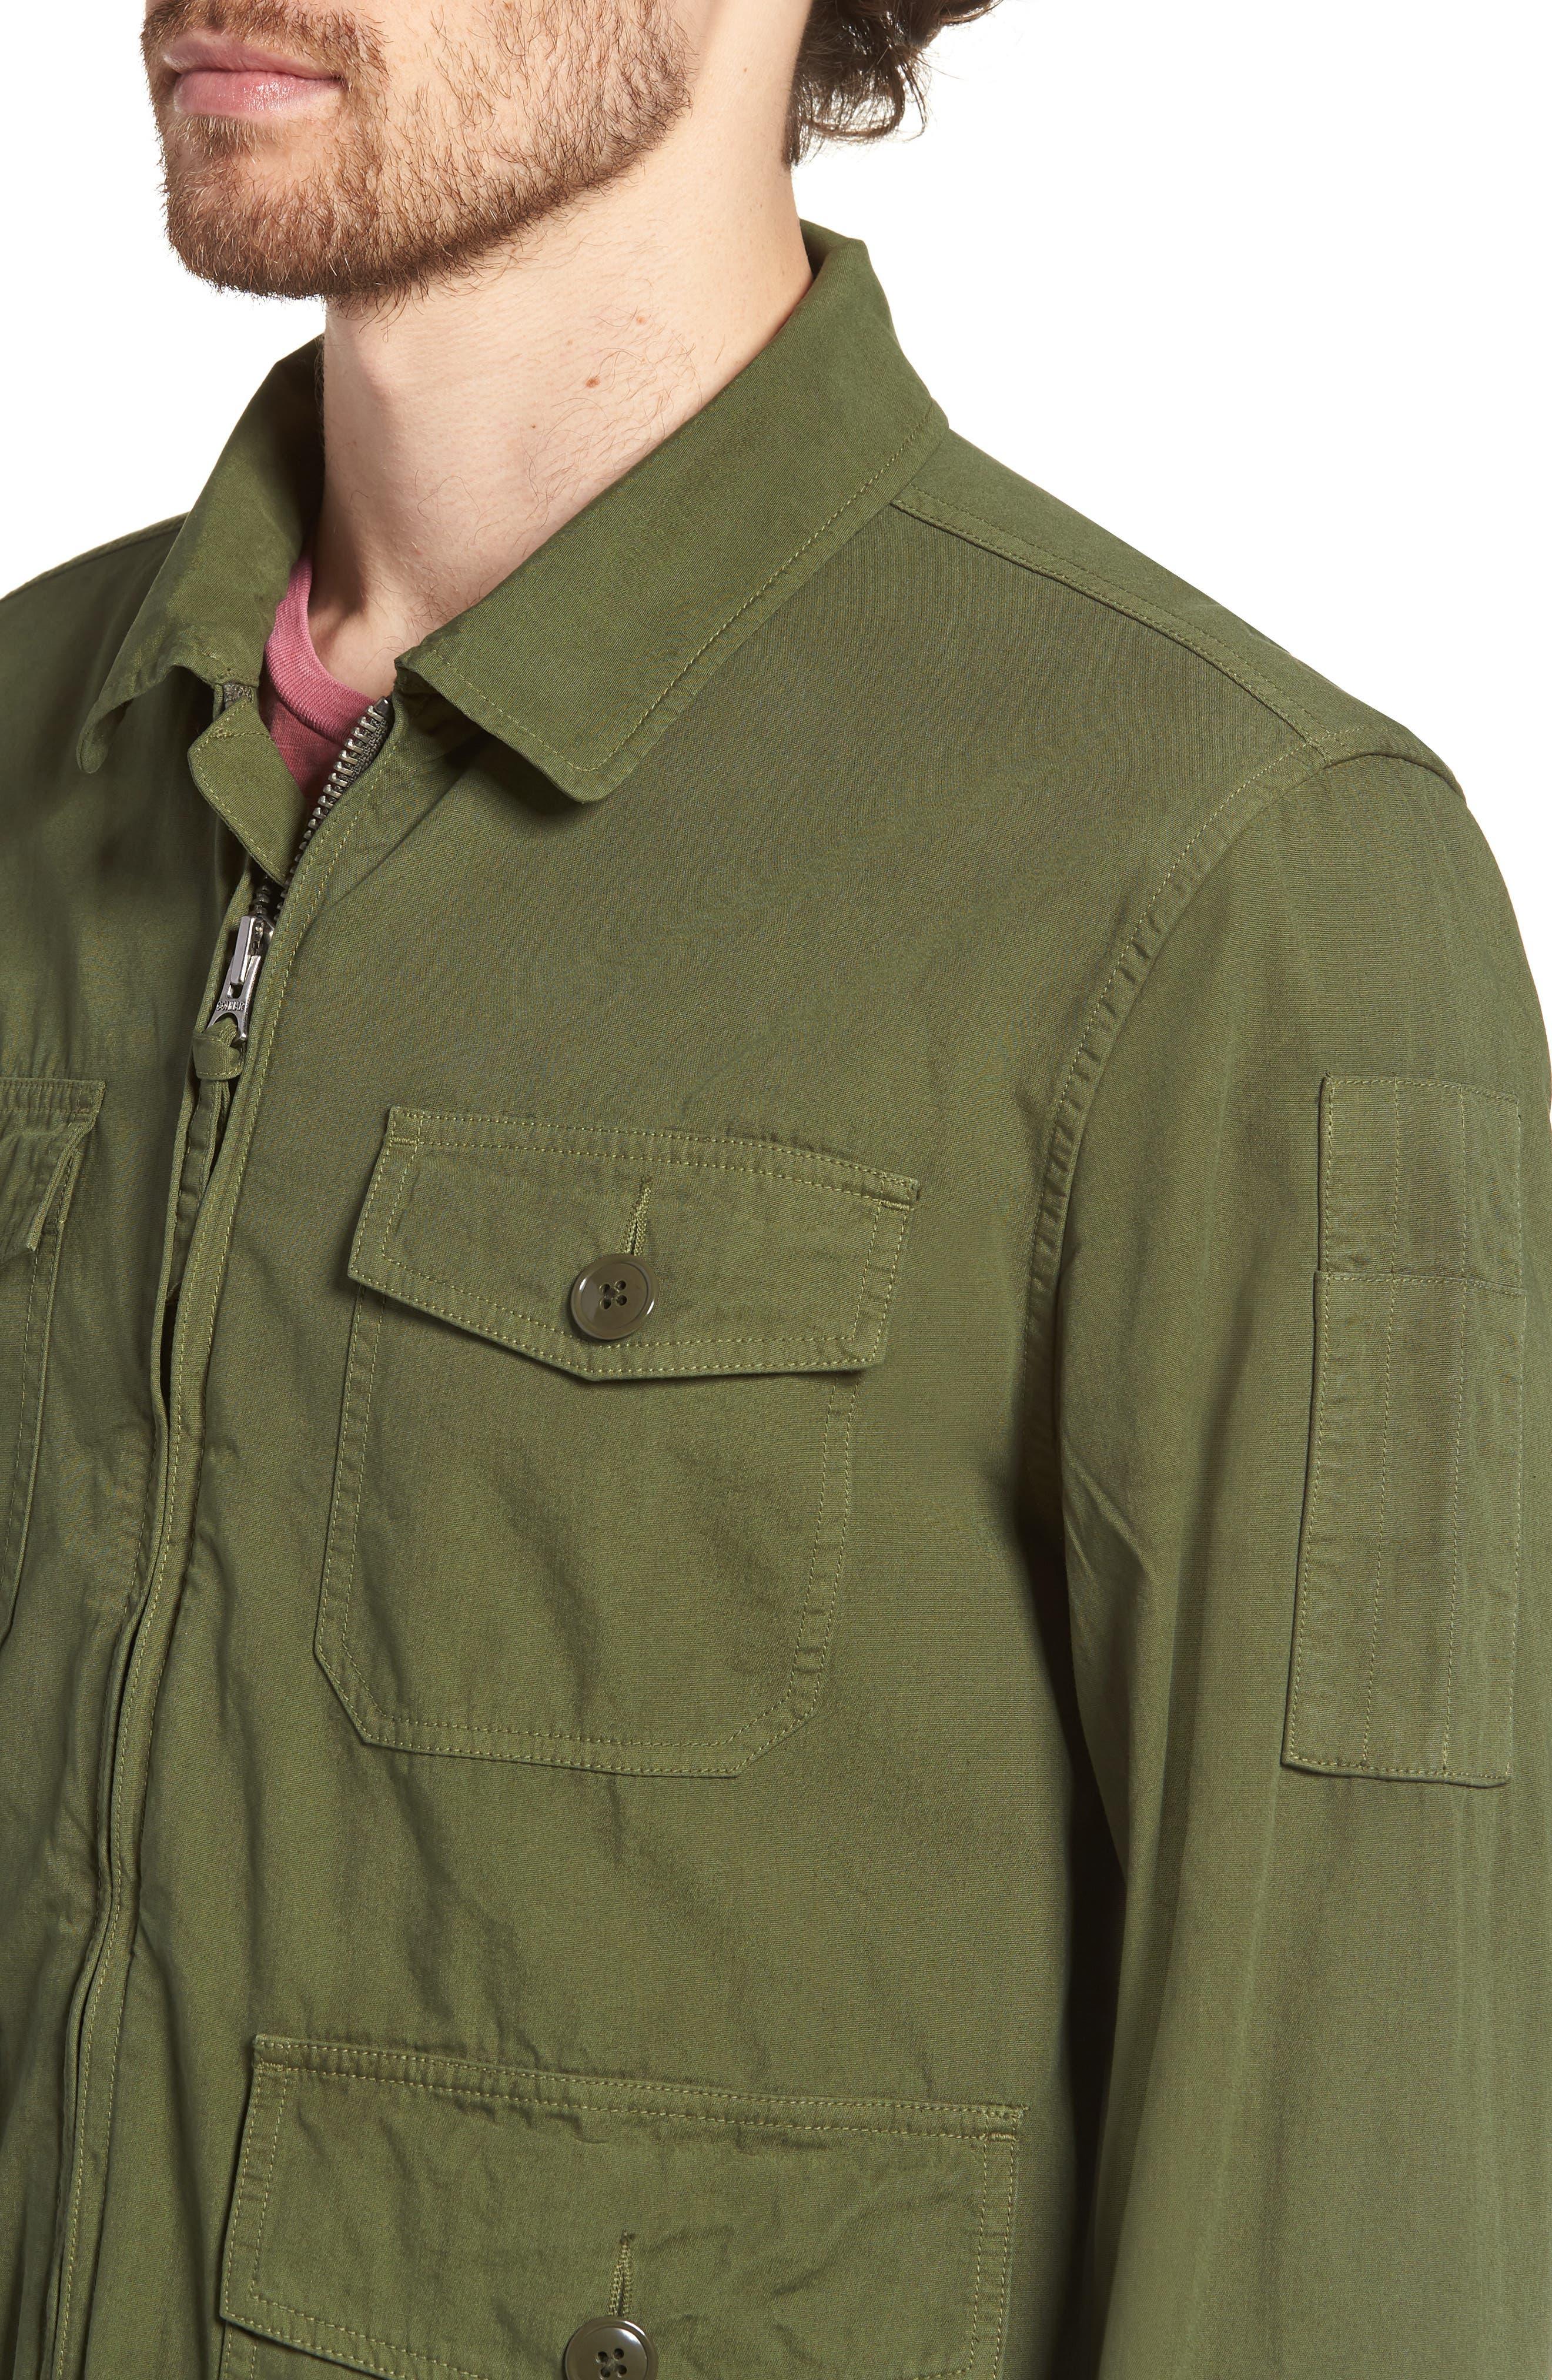 Four-Pocket Utility Jacket,                             Alternate thumbnail 4, color,                             300